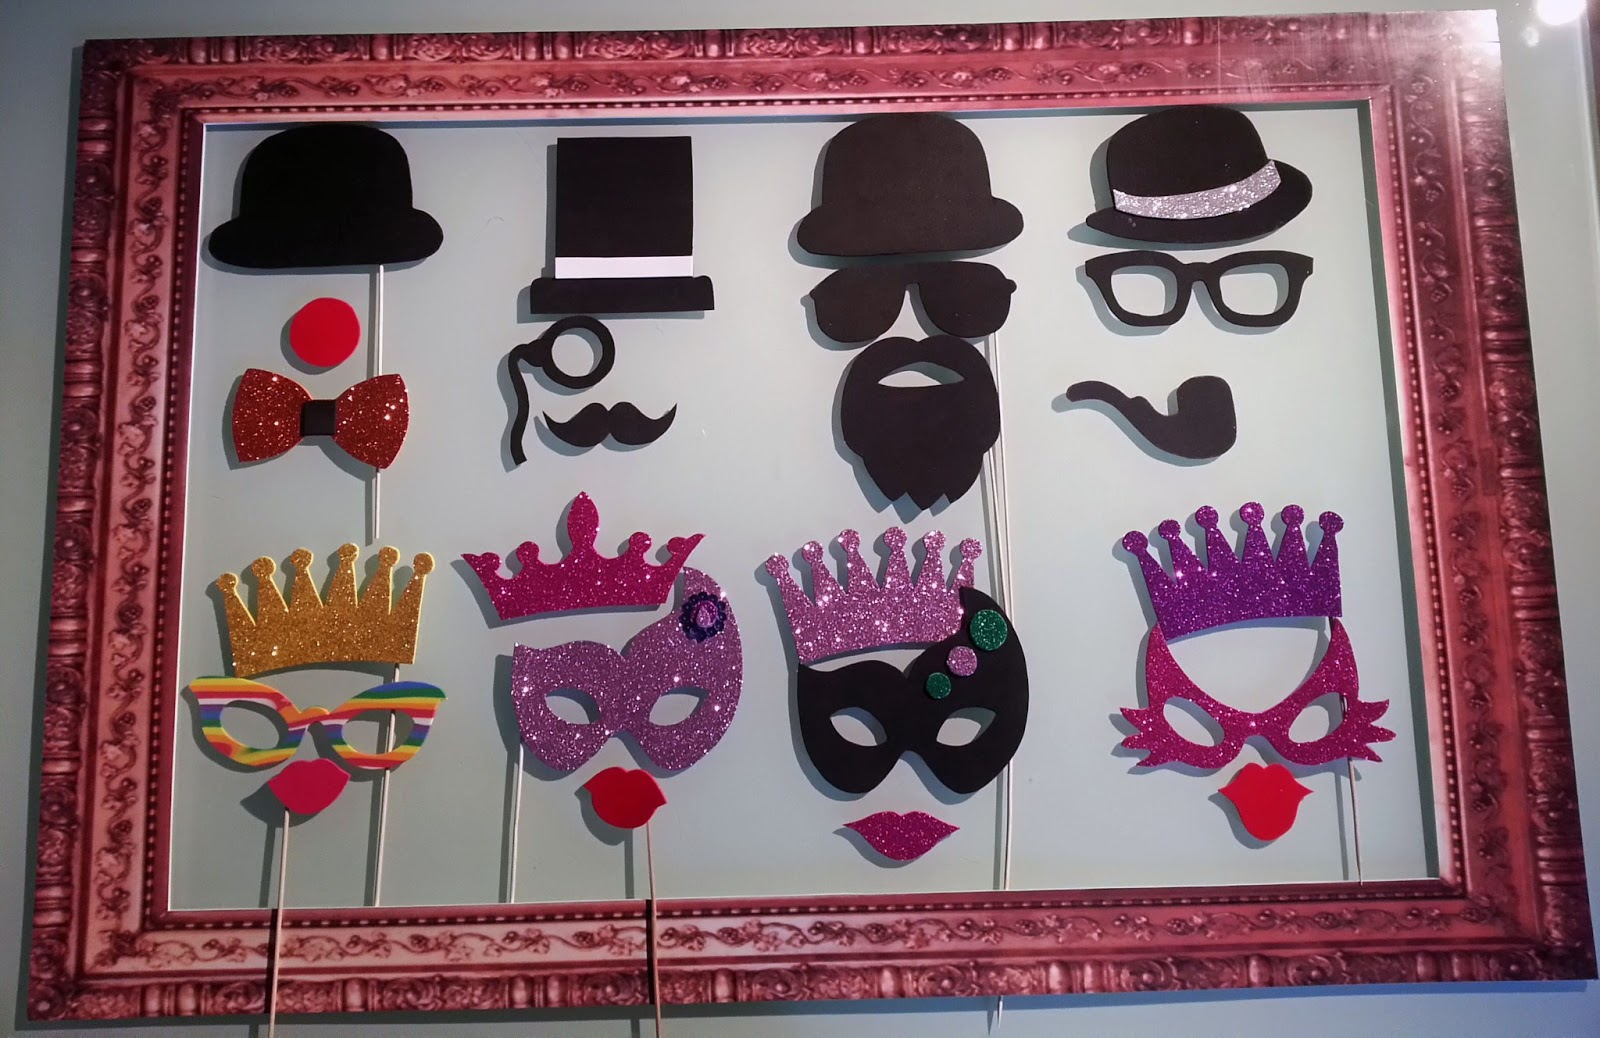 Manualidades creativas vintage nuestros accesorios atrezzo para photocall - Mascaras para carnaval manualidades ...